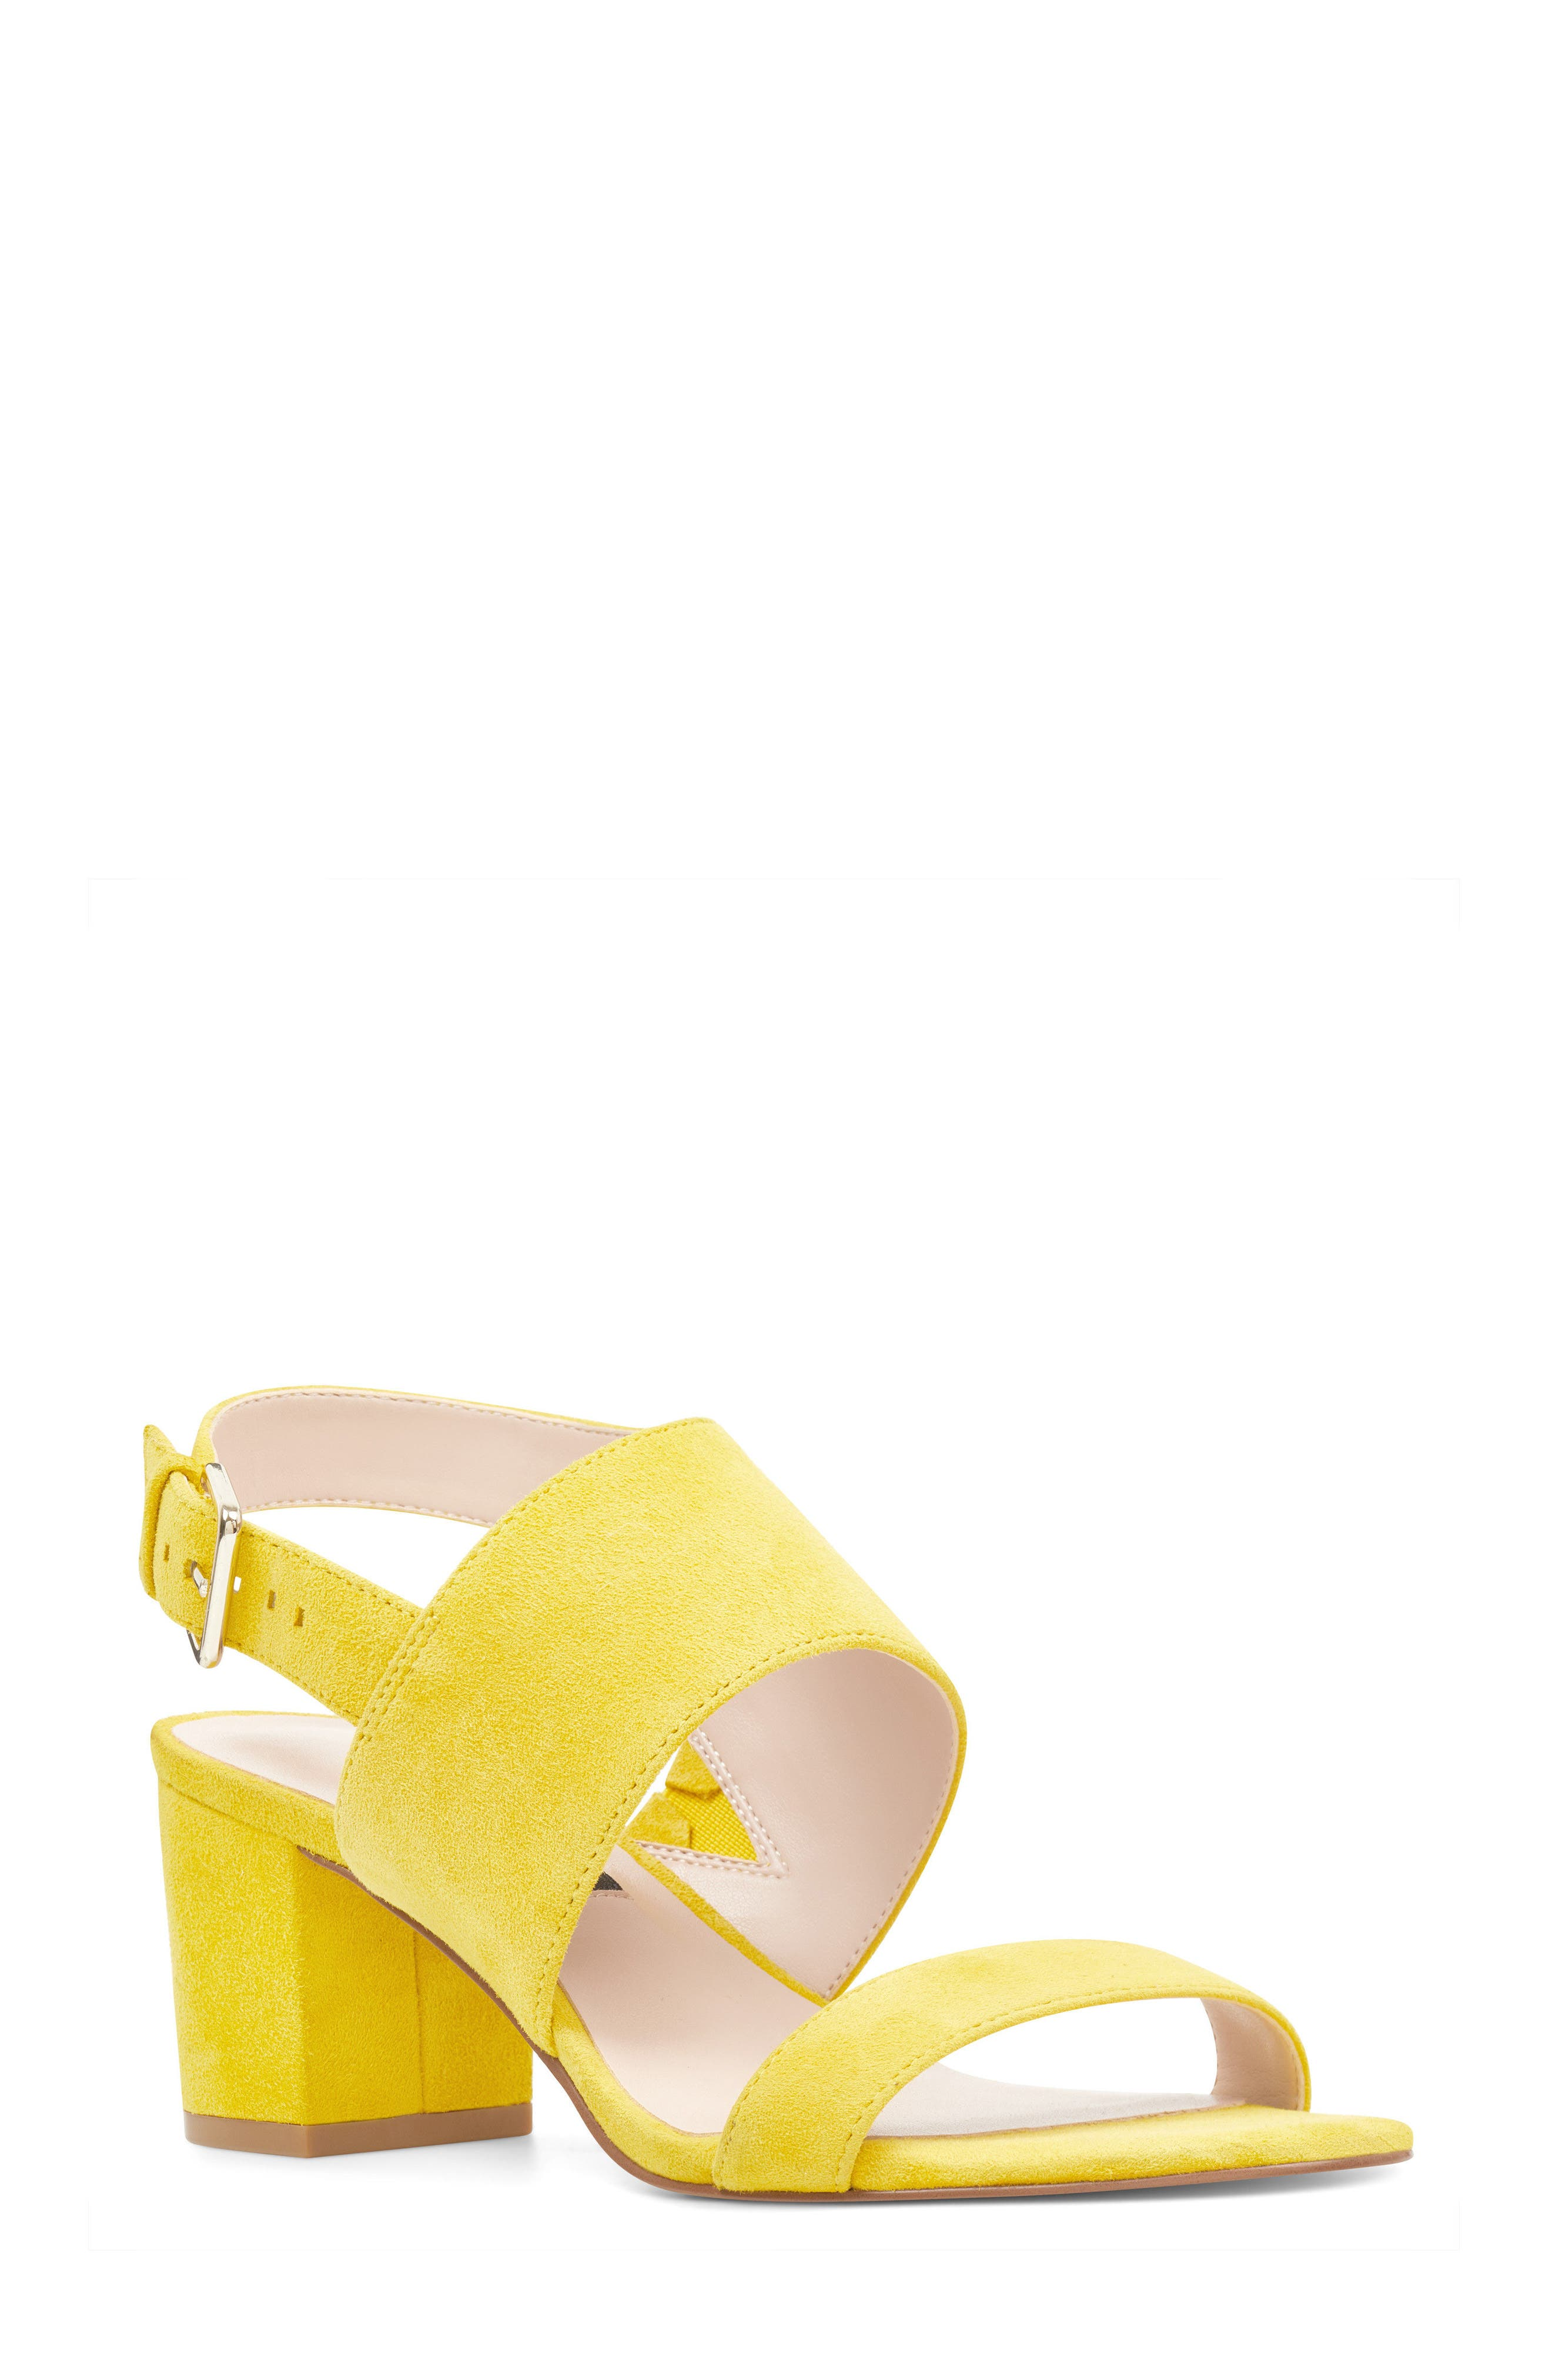 Forli Asymmetrical Sandal,                         Main,                         color, Yellow Suede